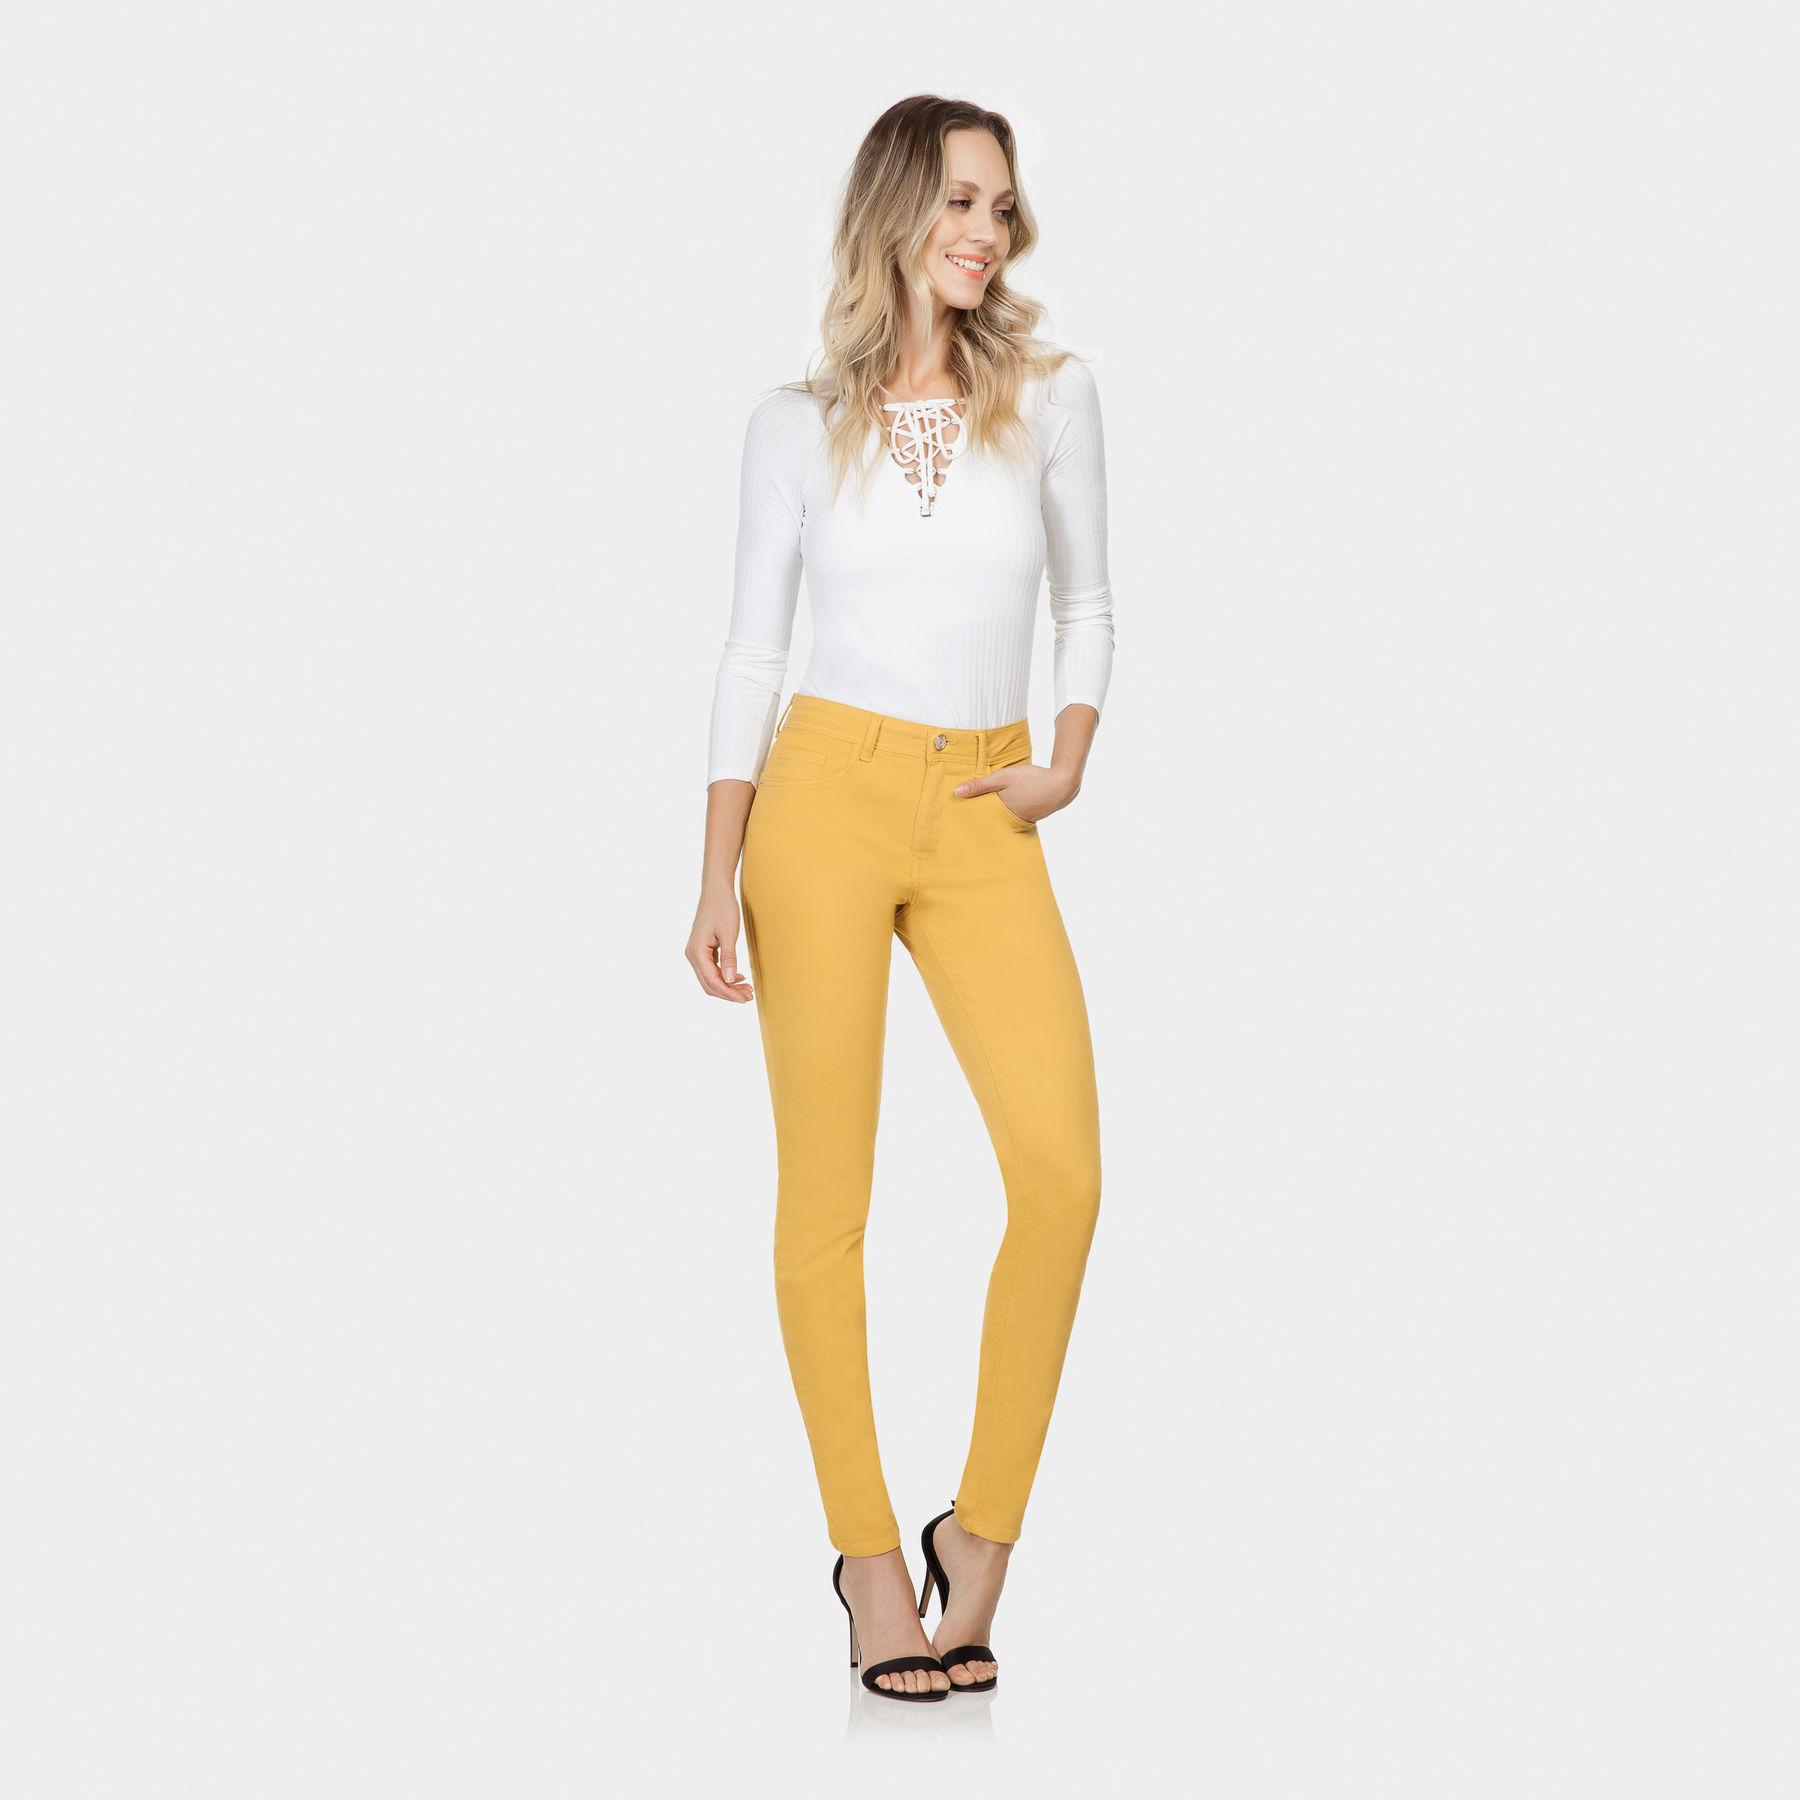 b3f790c1d Calça Jeans Bali Skinny Color Amarelo Acafrao - Lez a Lez